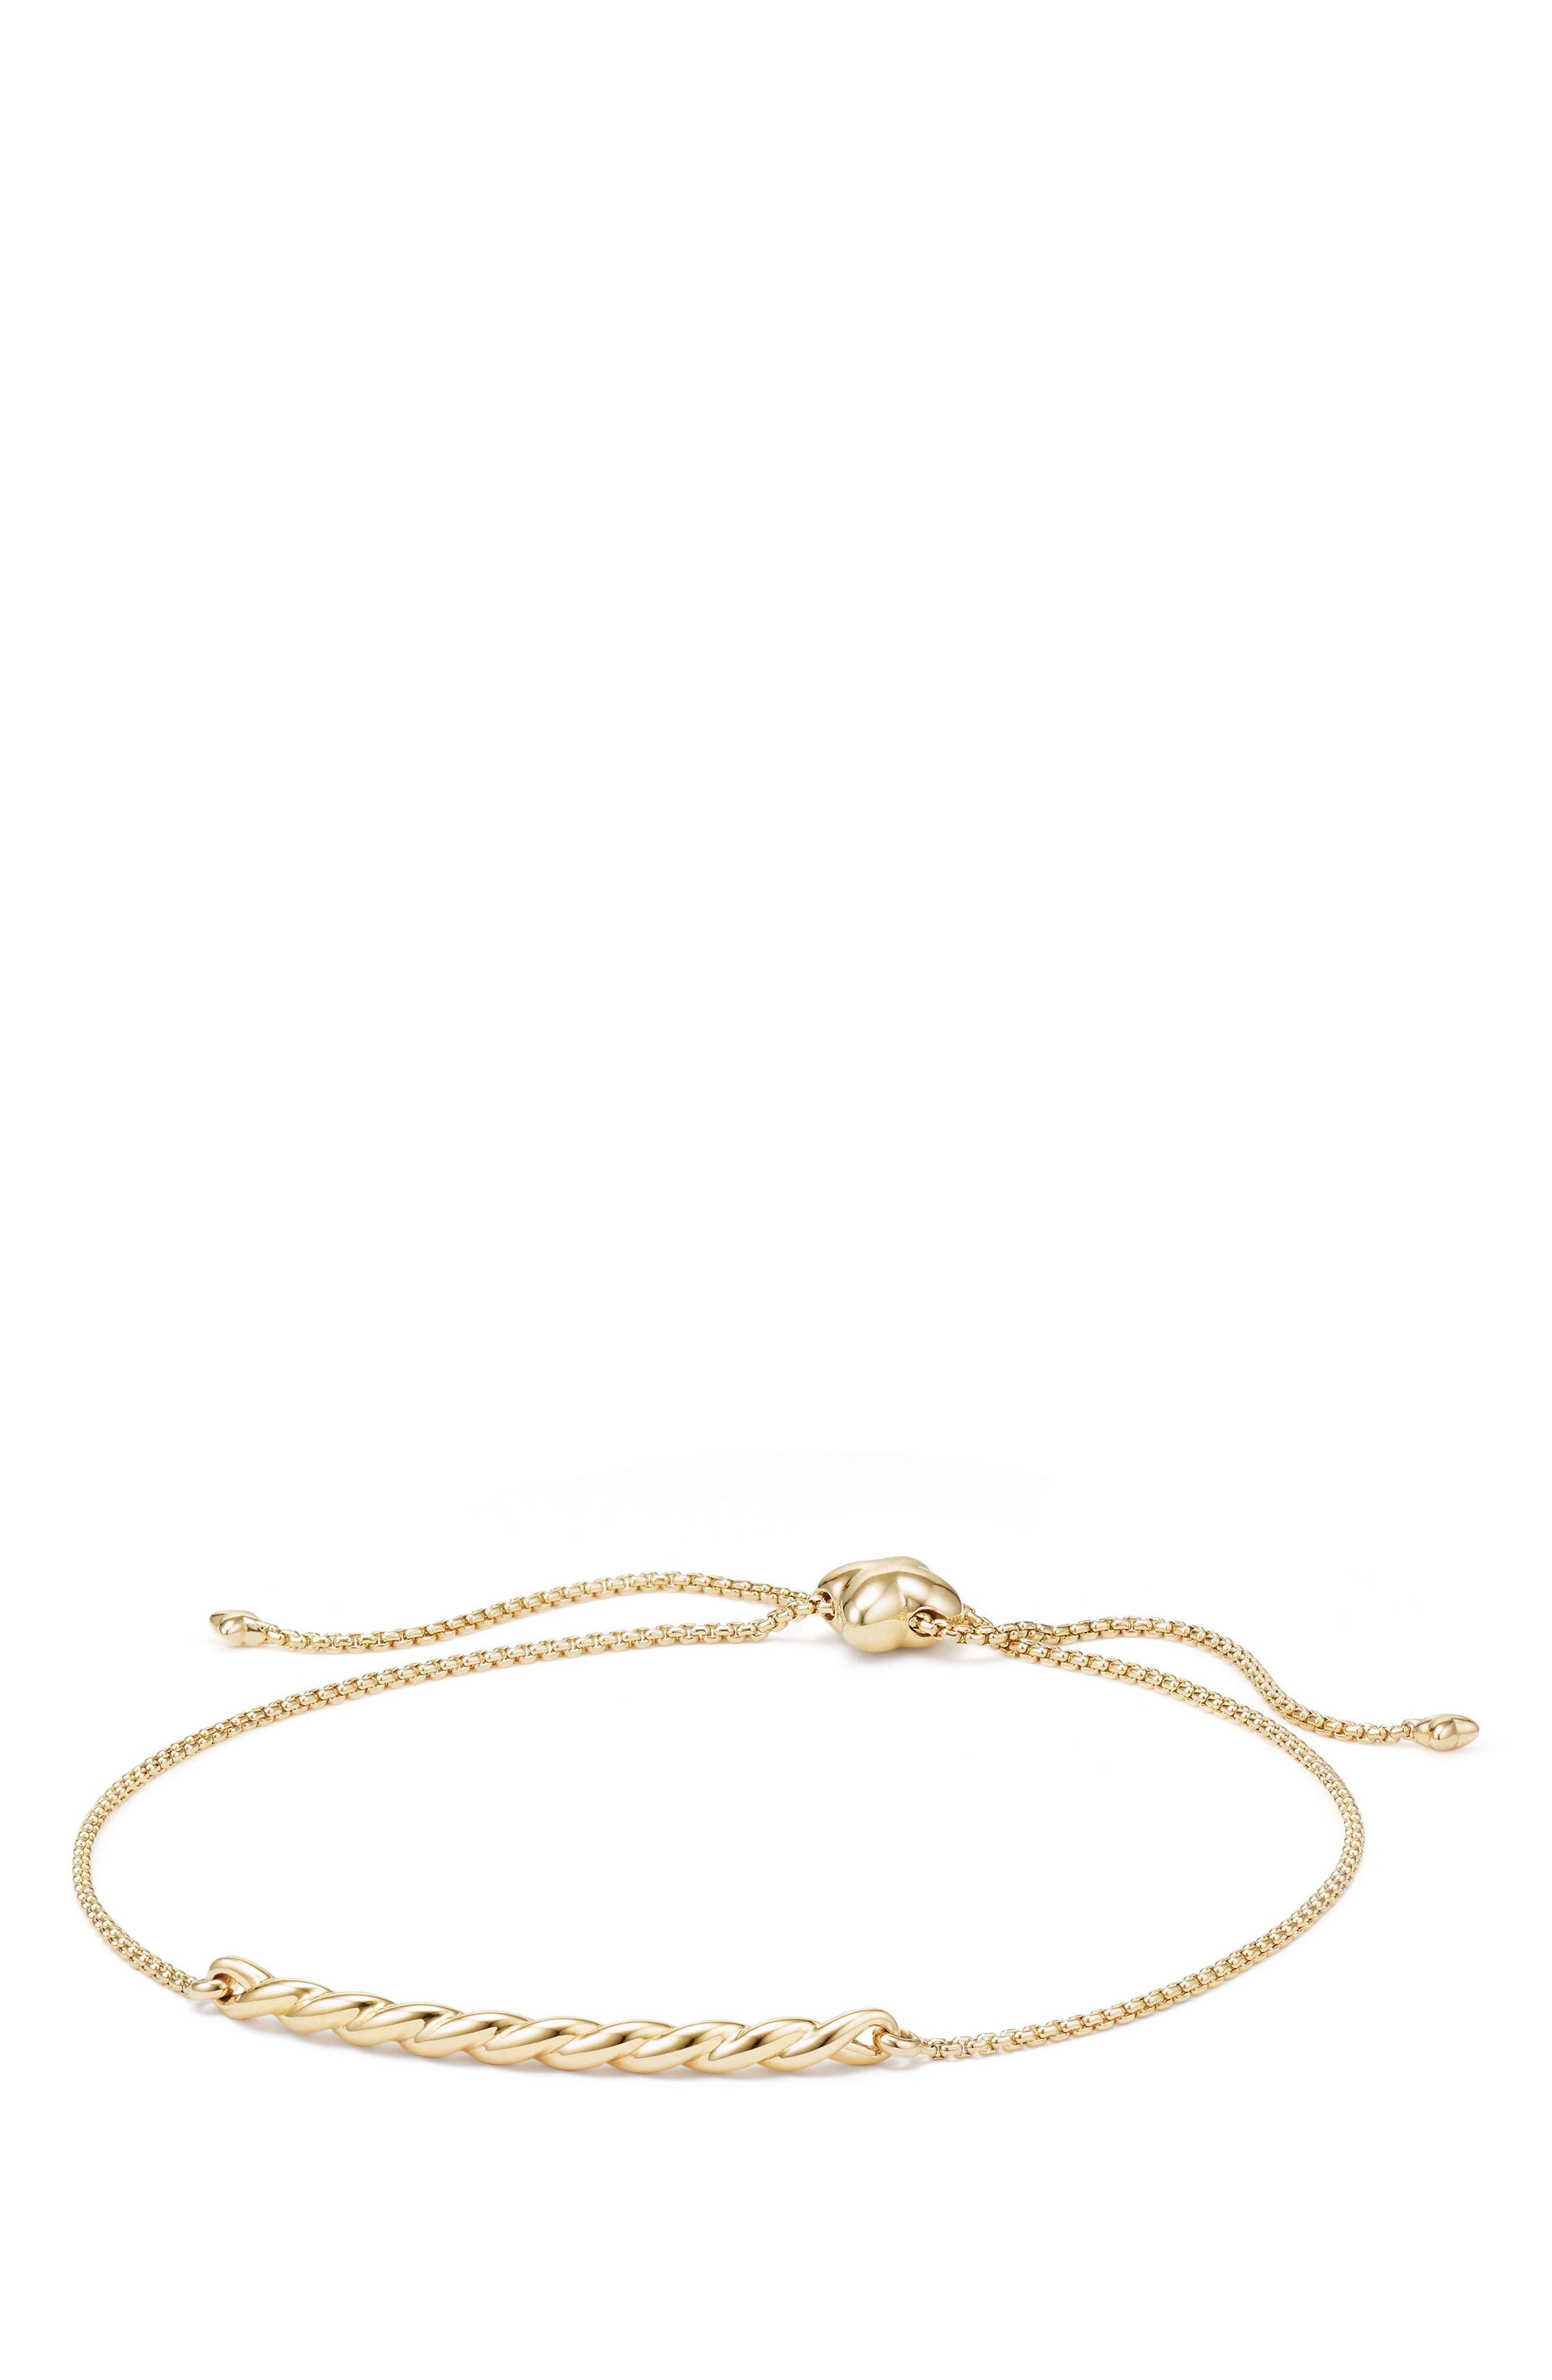 Paveflex Station Bracelet in 18K Gold,                             Main thumbnail 1, color,                             Yellow Gold